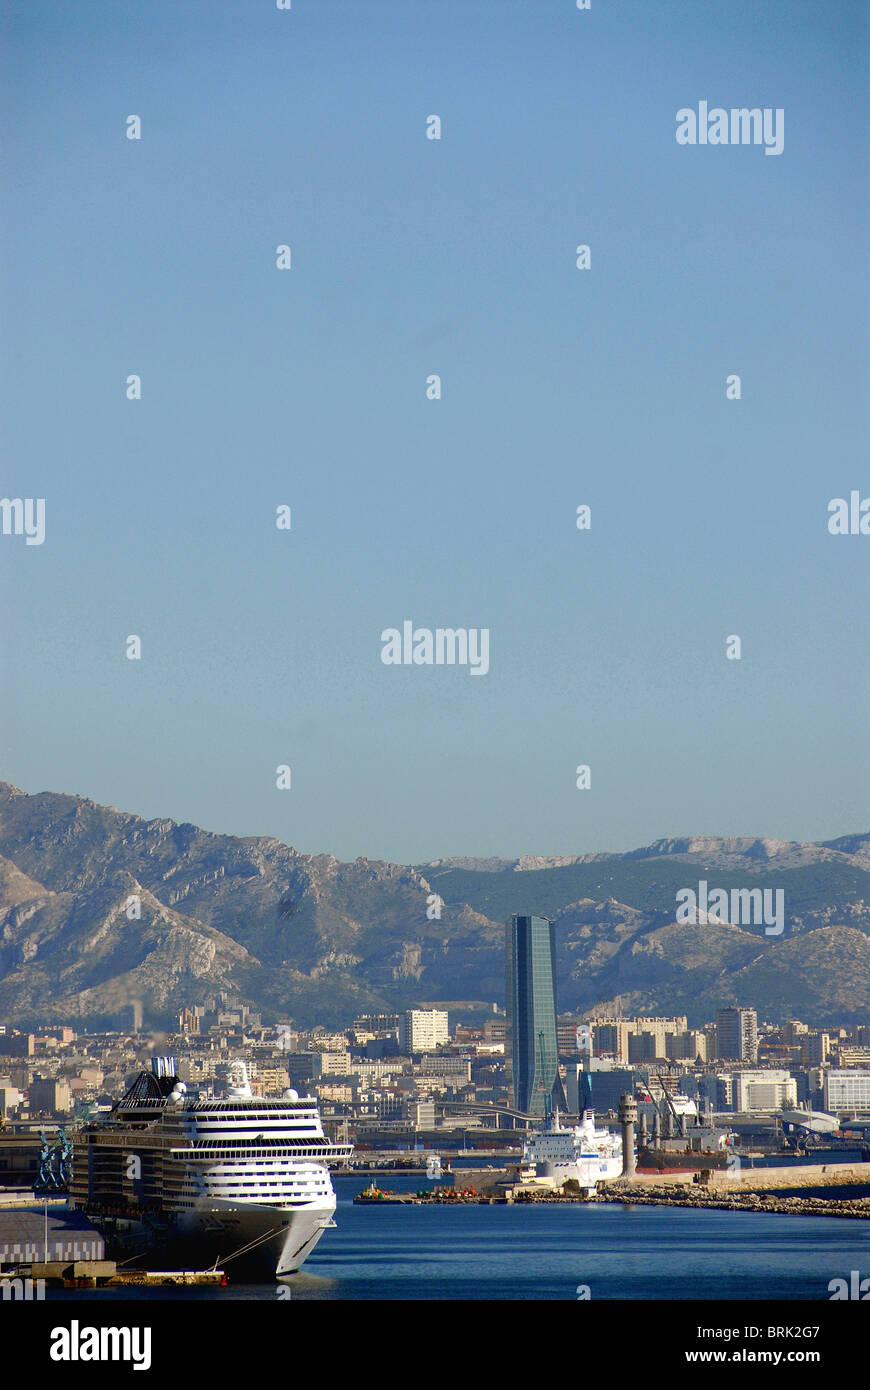 Joliette port and CMA-CGM tower, Marseille - Stock Image